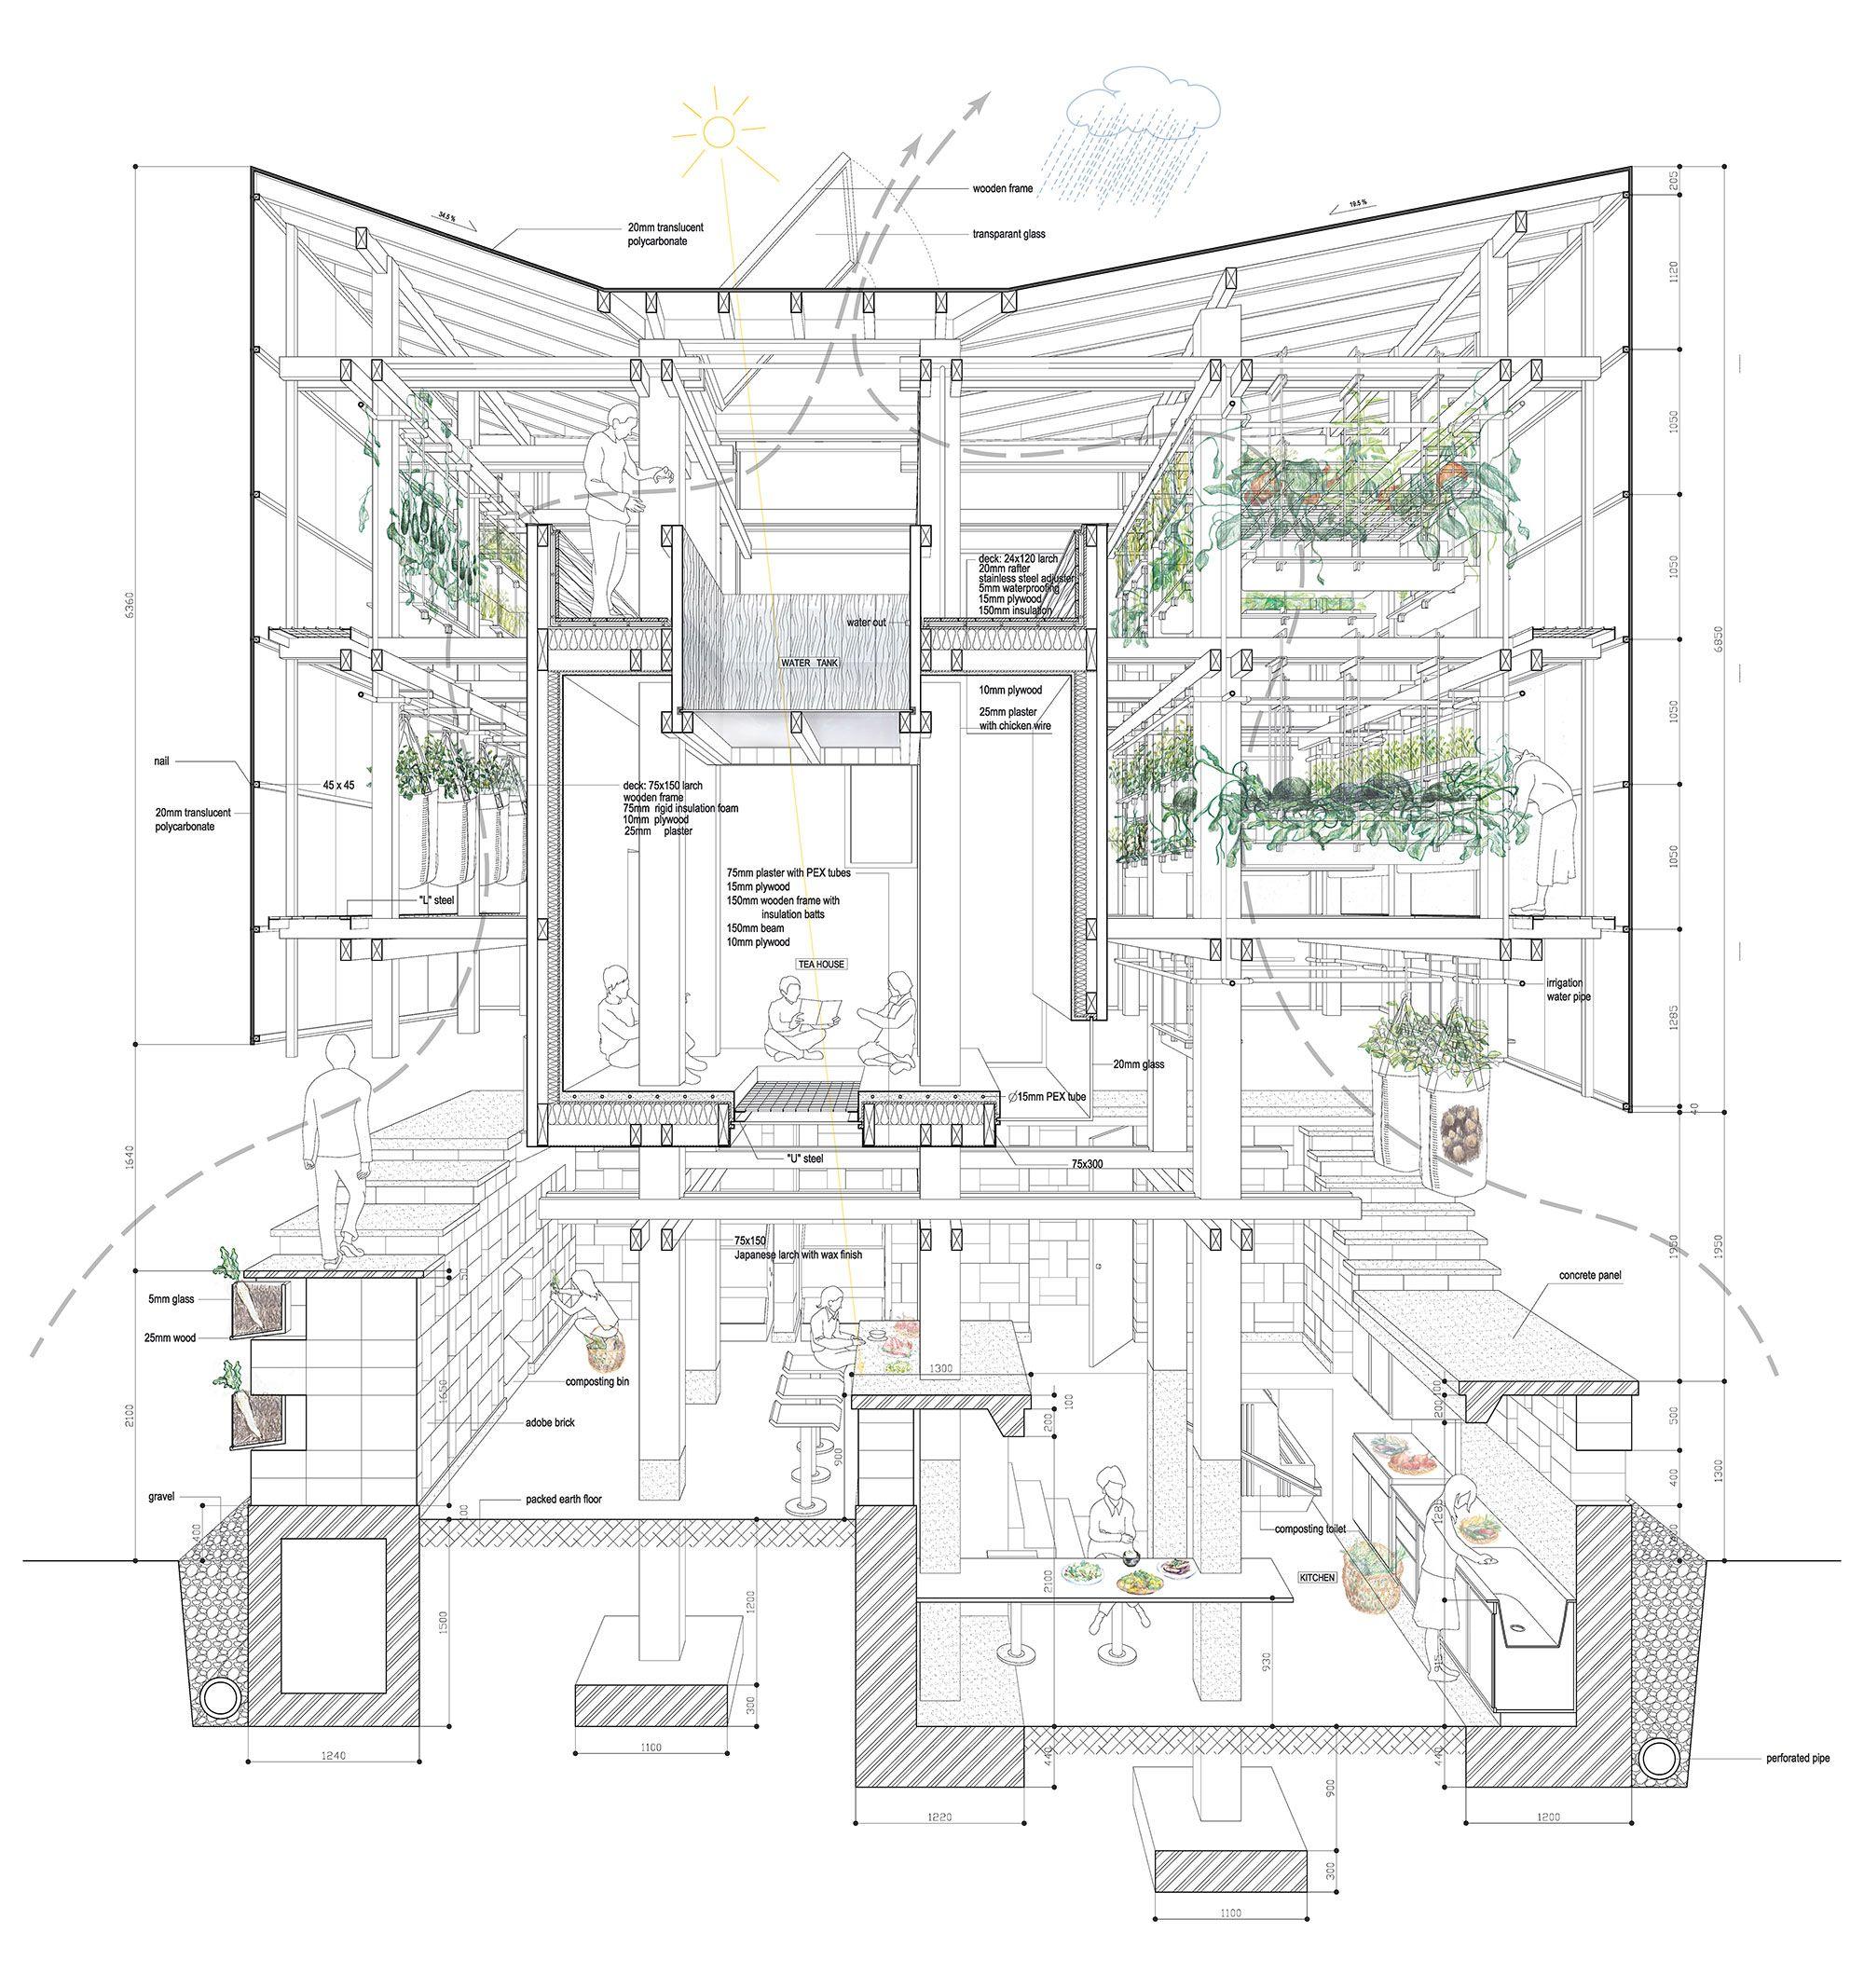 Nest We Grow Memu Meadows. 2015 Kengo Kuma & Associates, UC Berkeley CED Graduate Team.